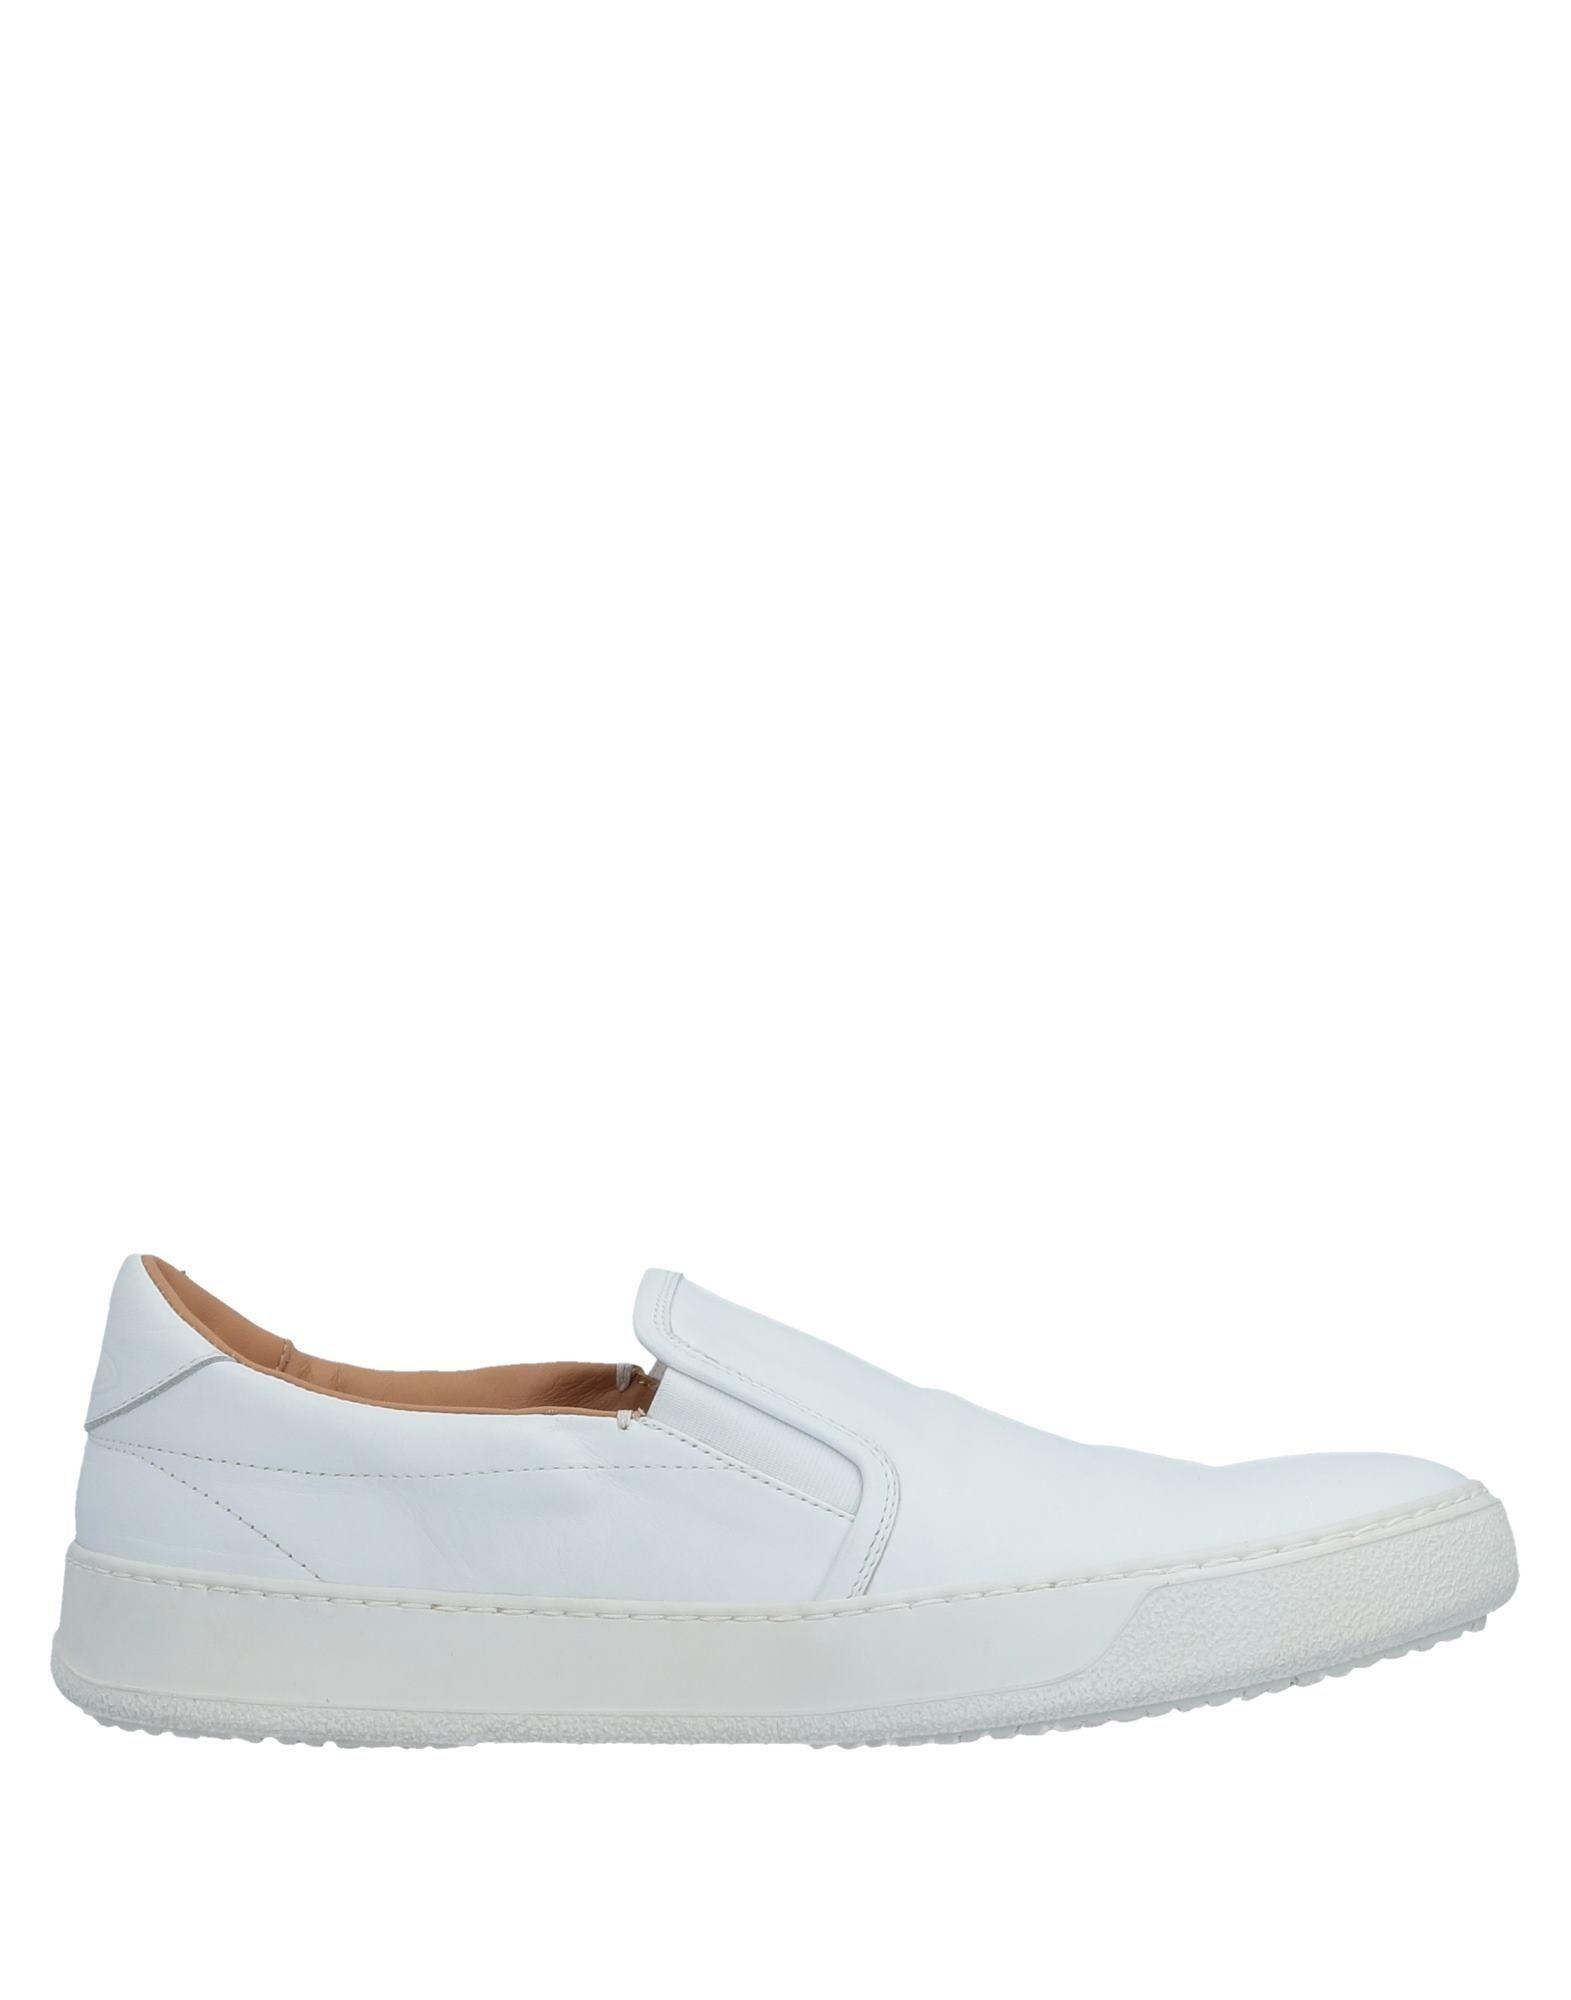 Sneakers Vivienne Westwood Homme - Sneakers Vivienne Westwood  Blanc Chaussures casual sauvages